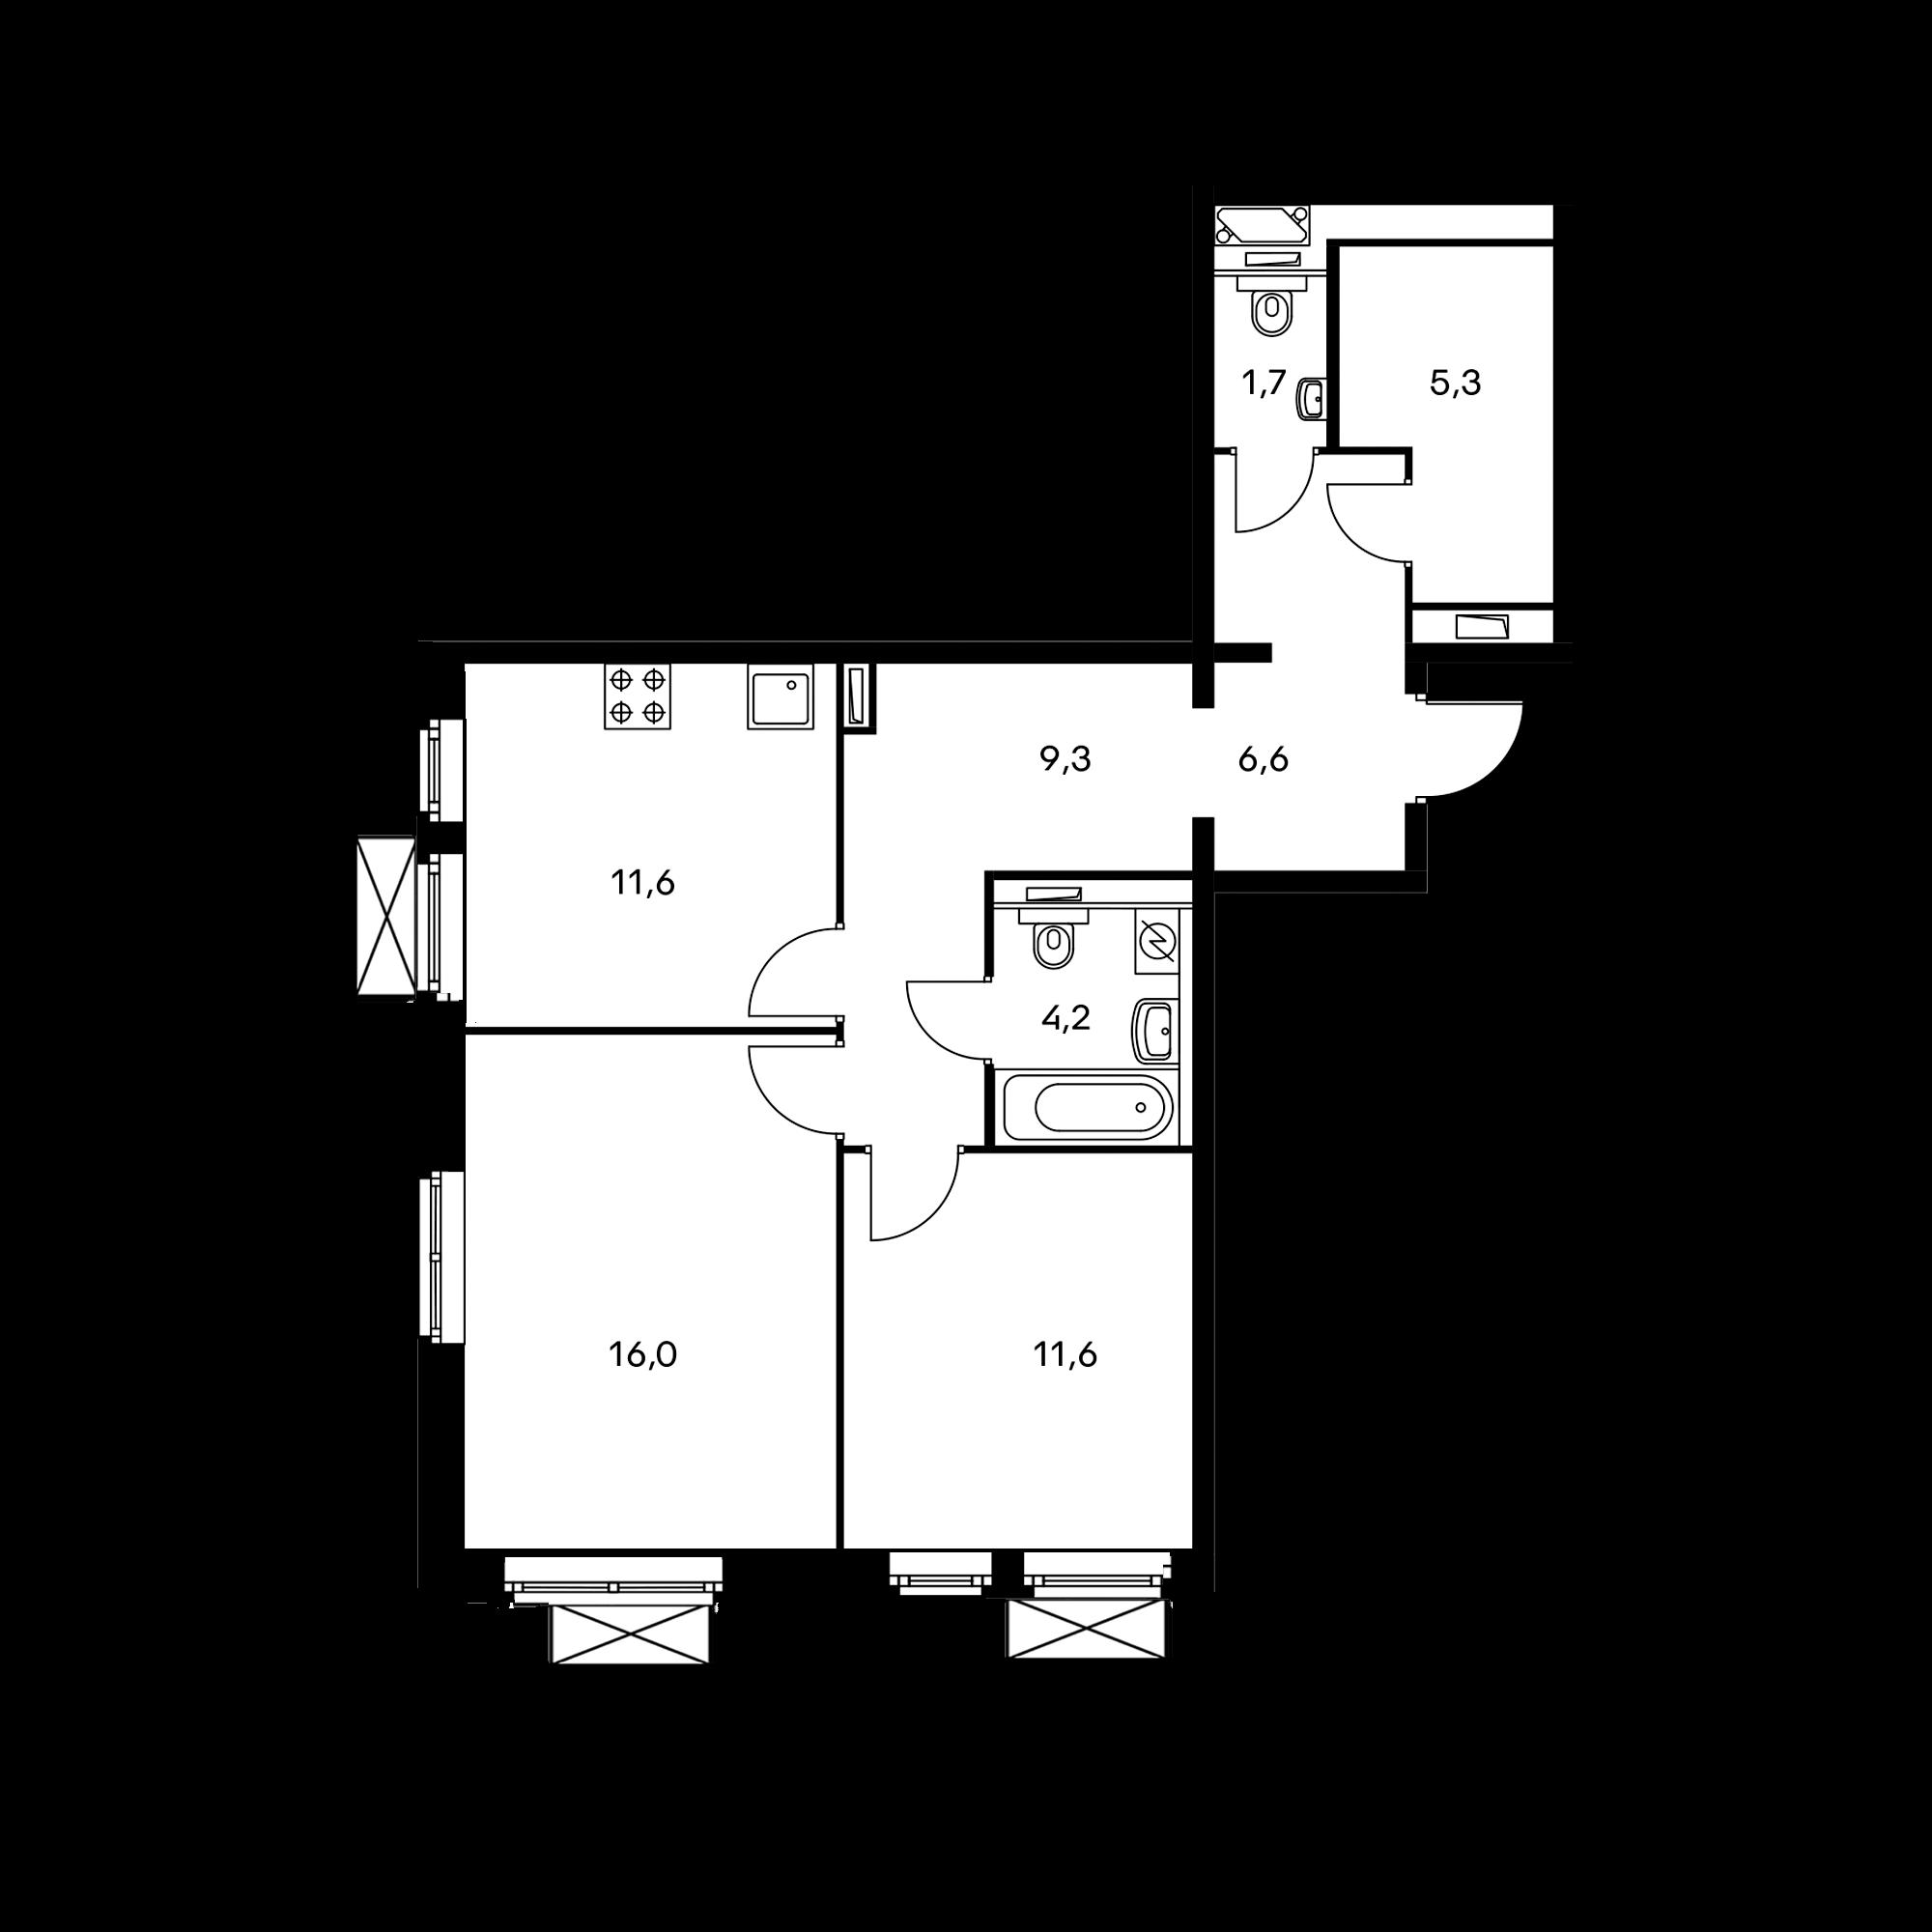 2KL22_10.2-1